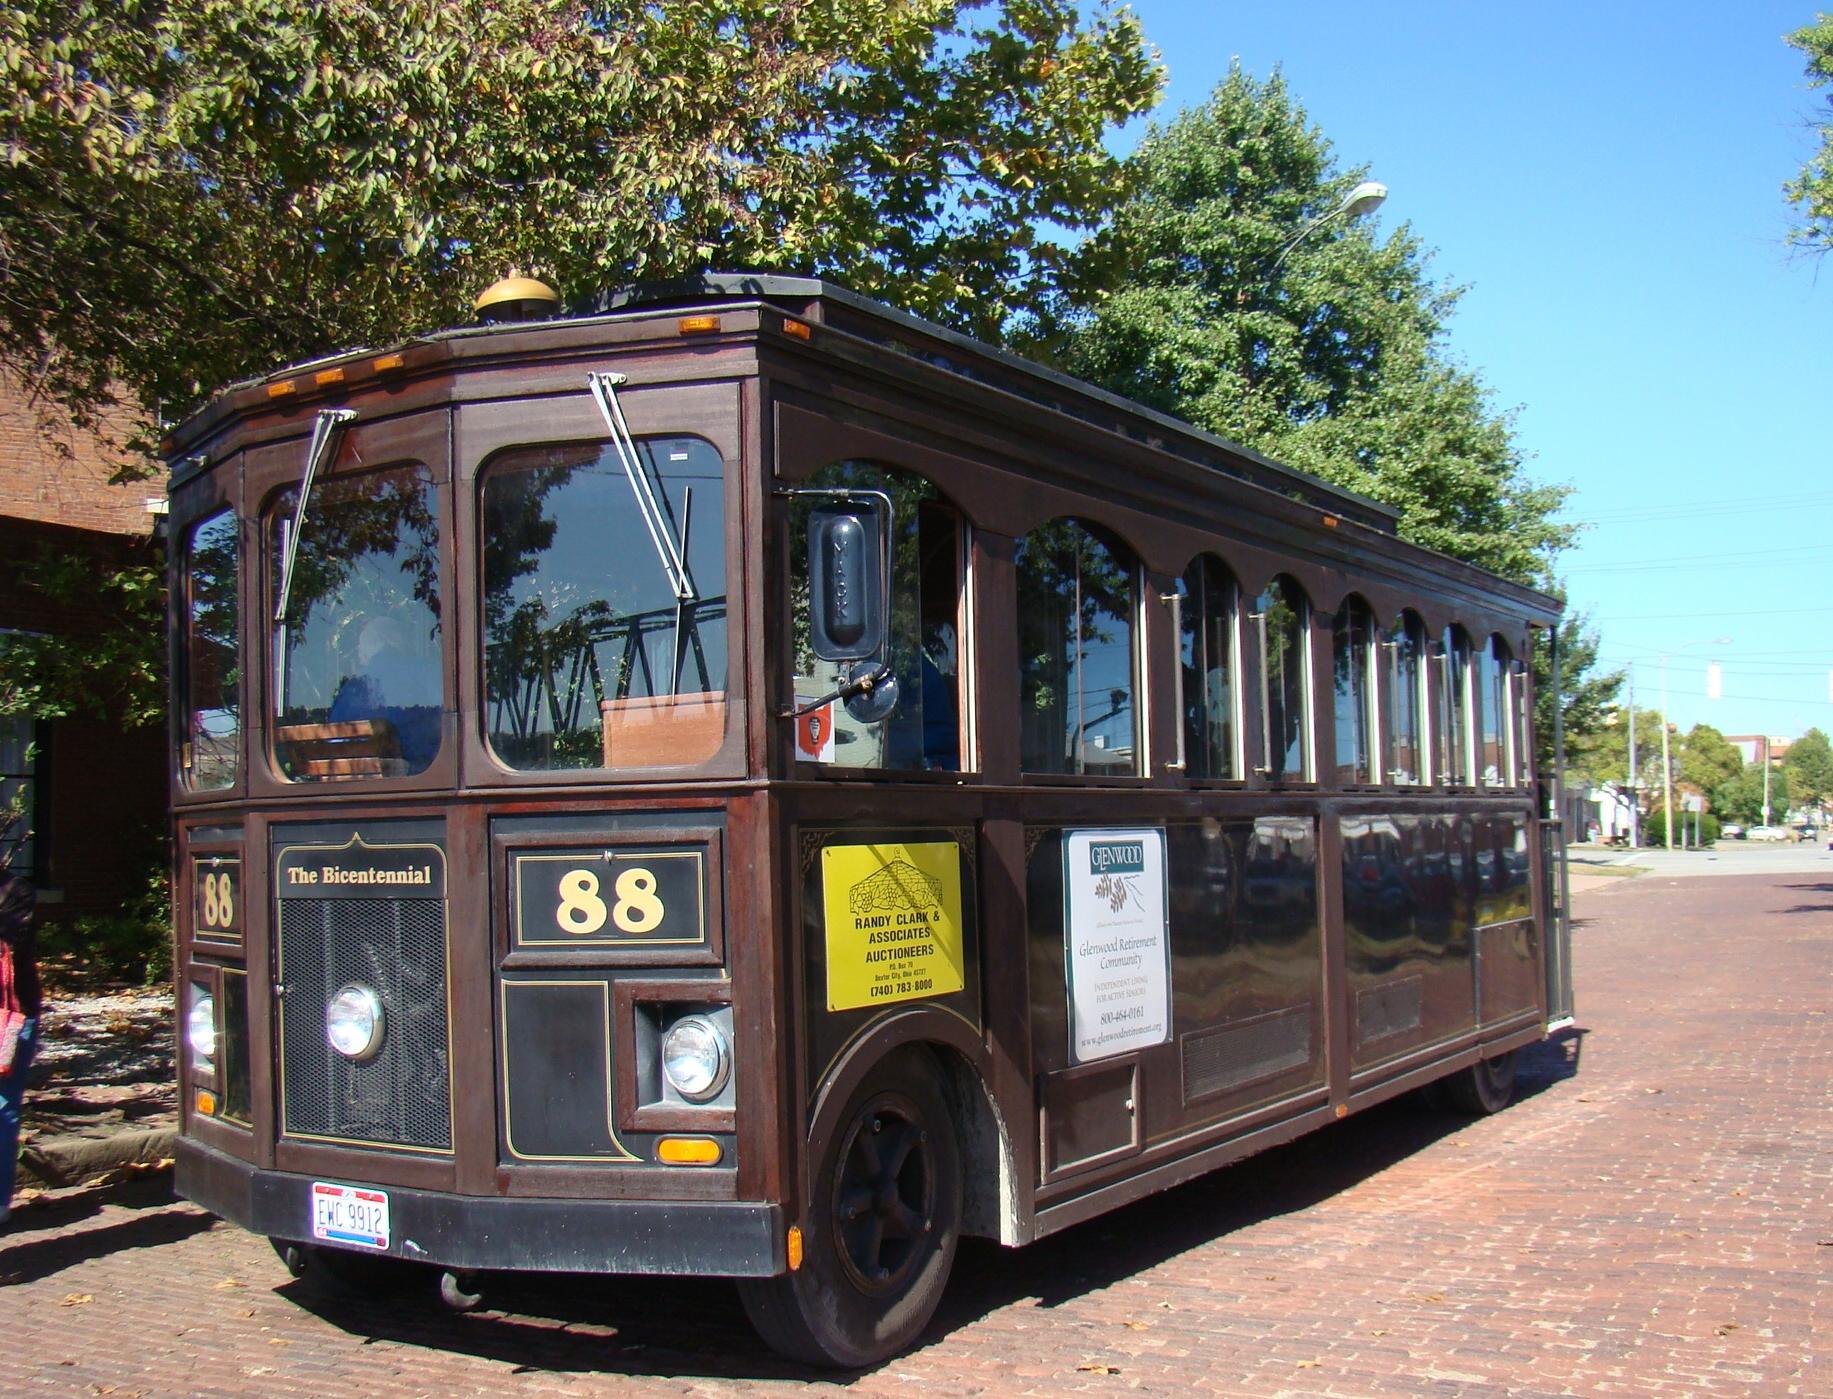 Trolley on Brick Street